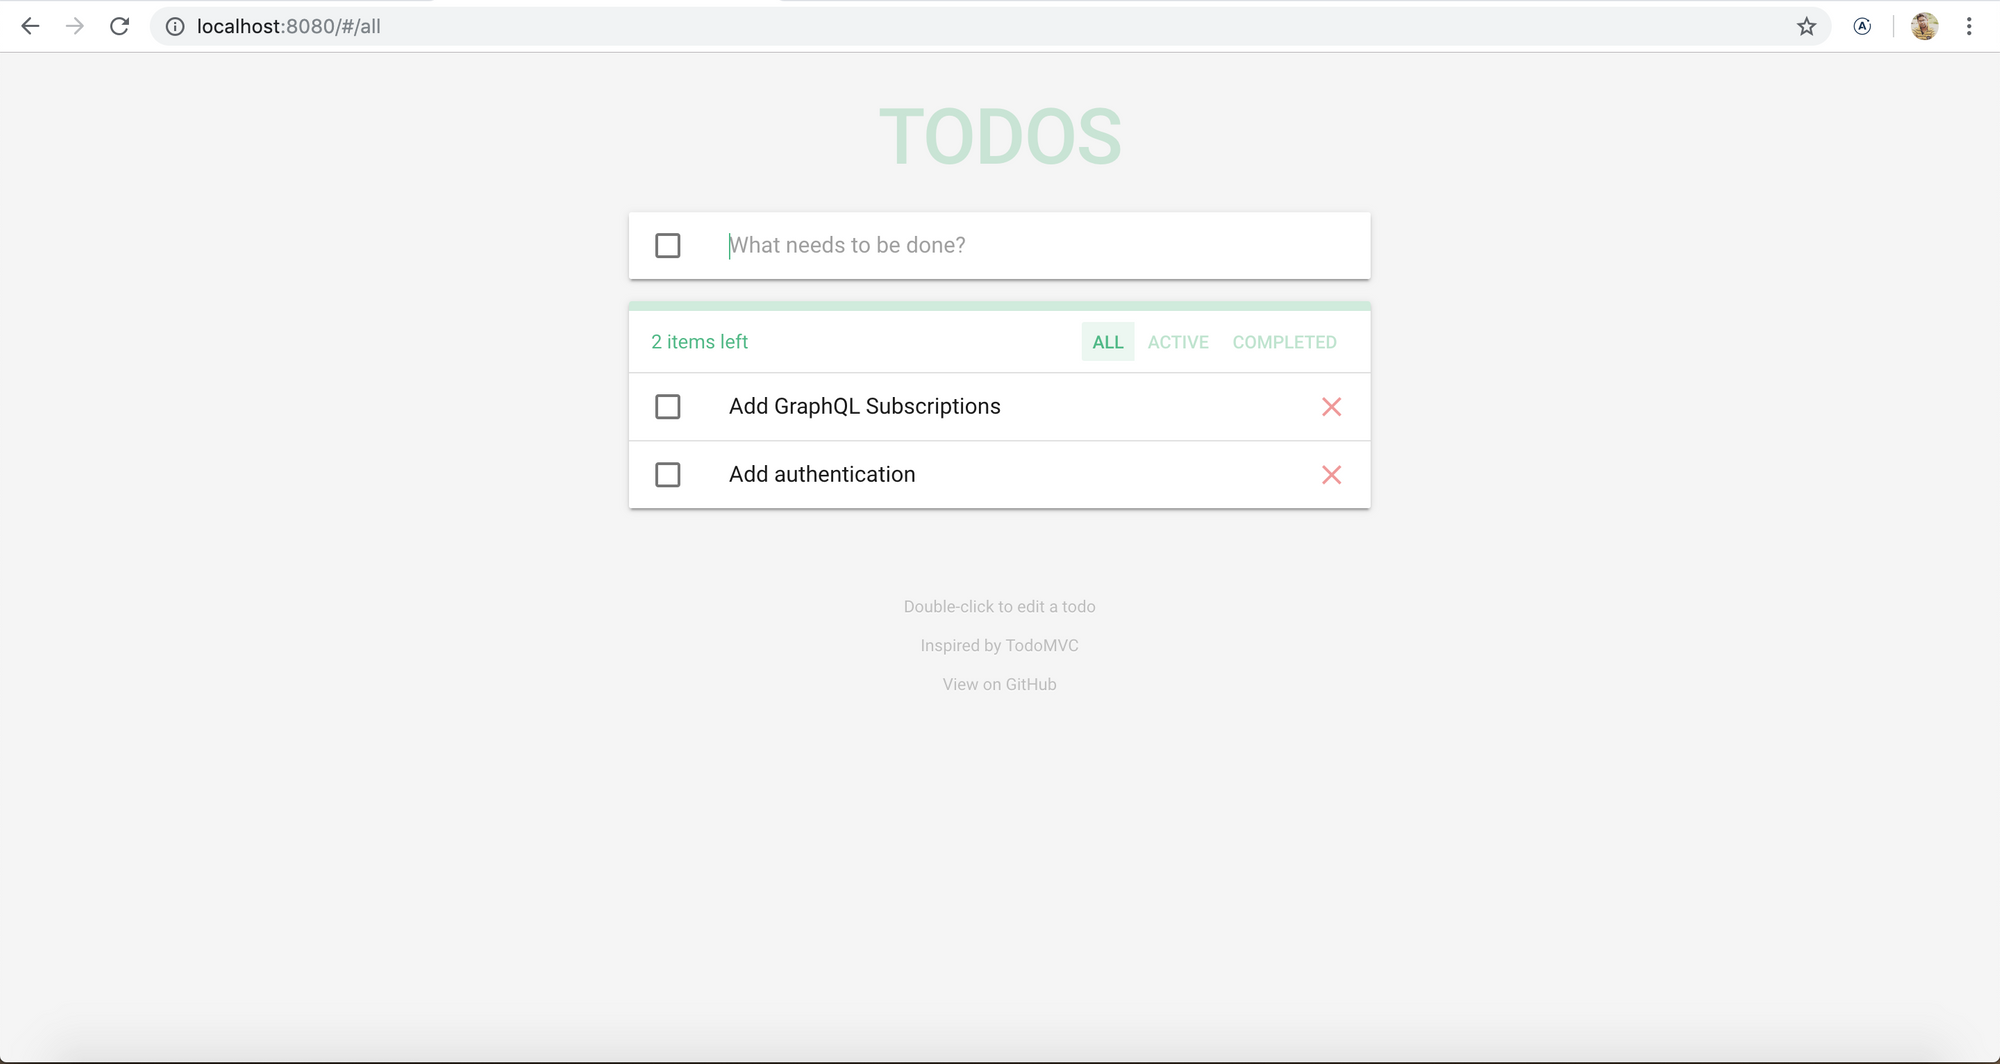 Building a Progressive Todo Web App with Vuetify, Vuex and GraphQL